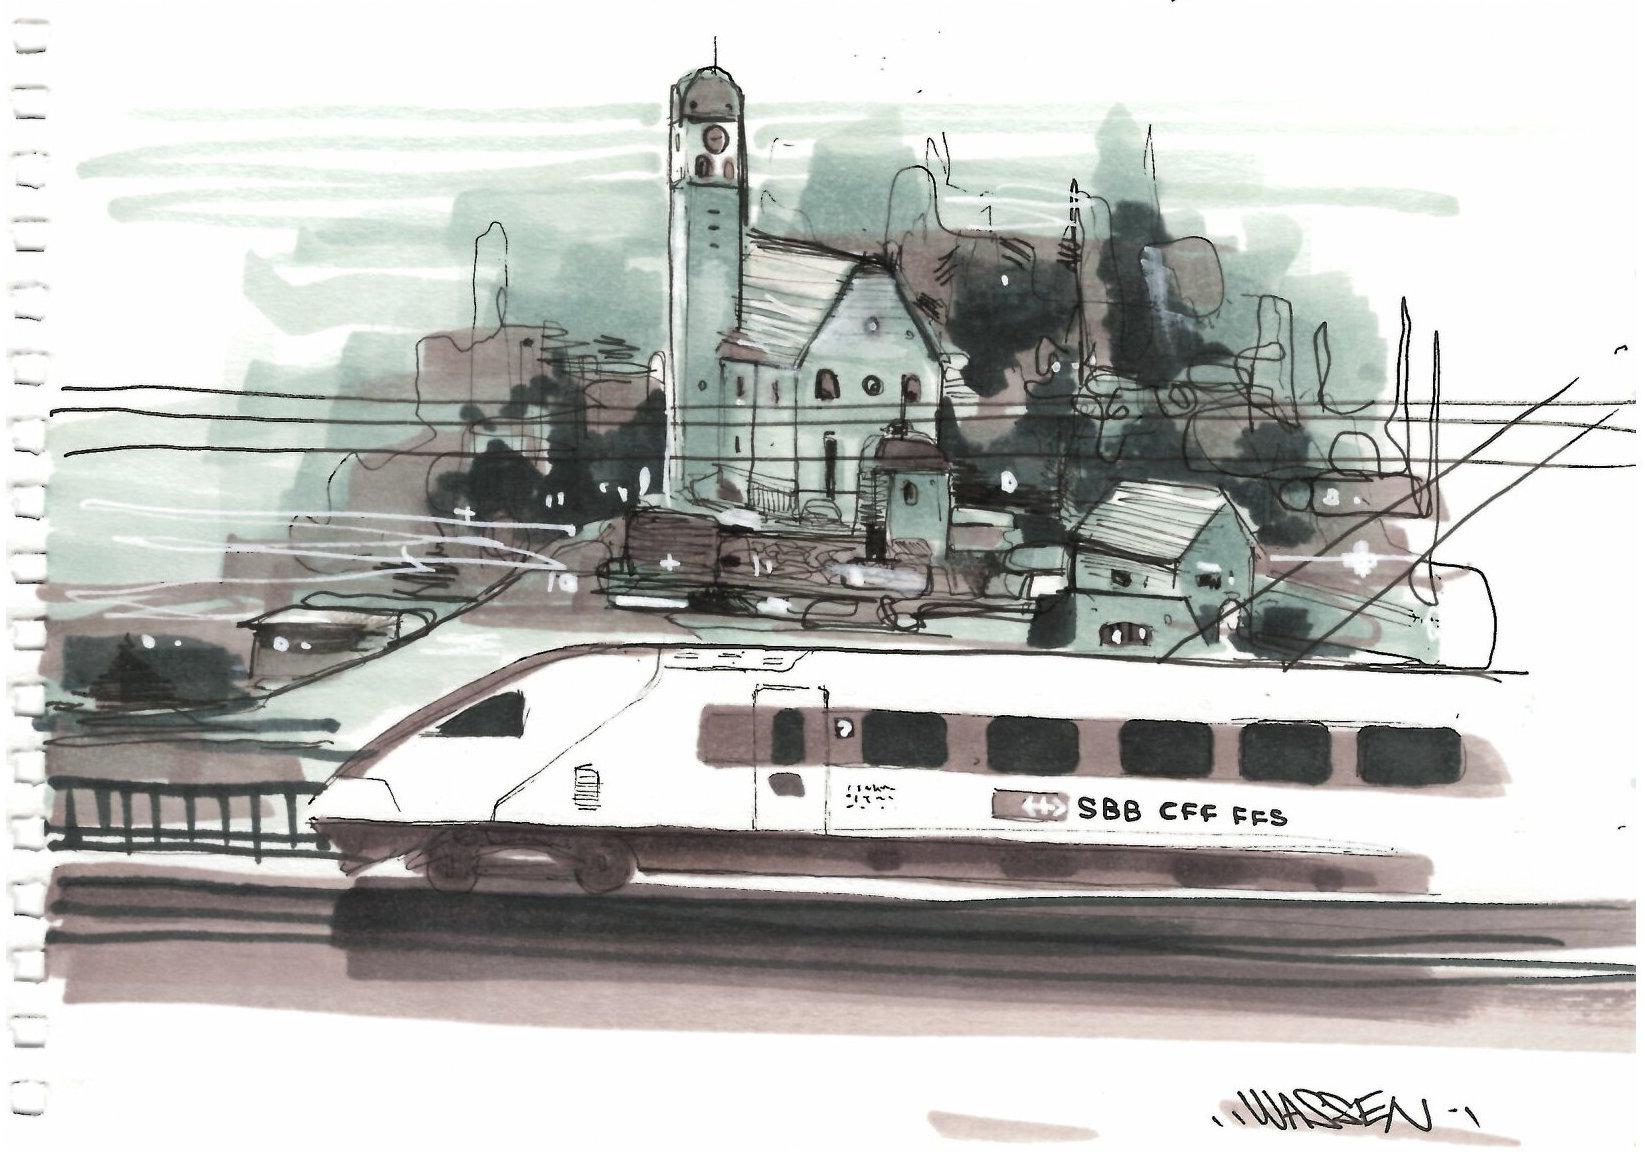 Dessin De Train Suisse Rabde500 A Wassen Nadib Bandi Dessin Sketch